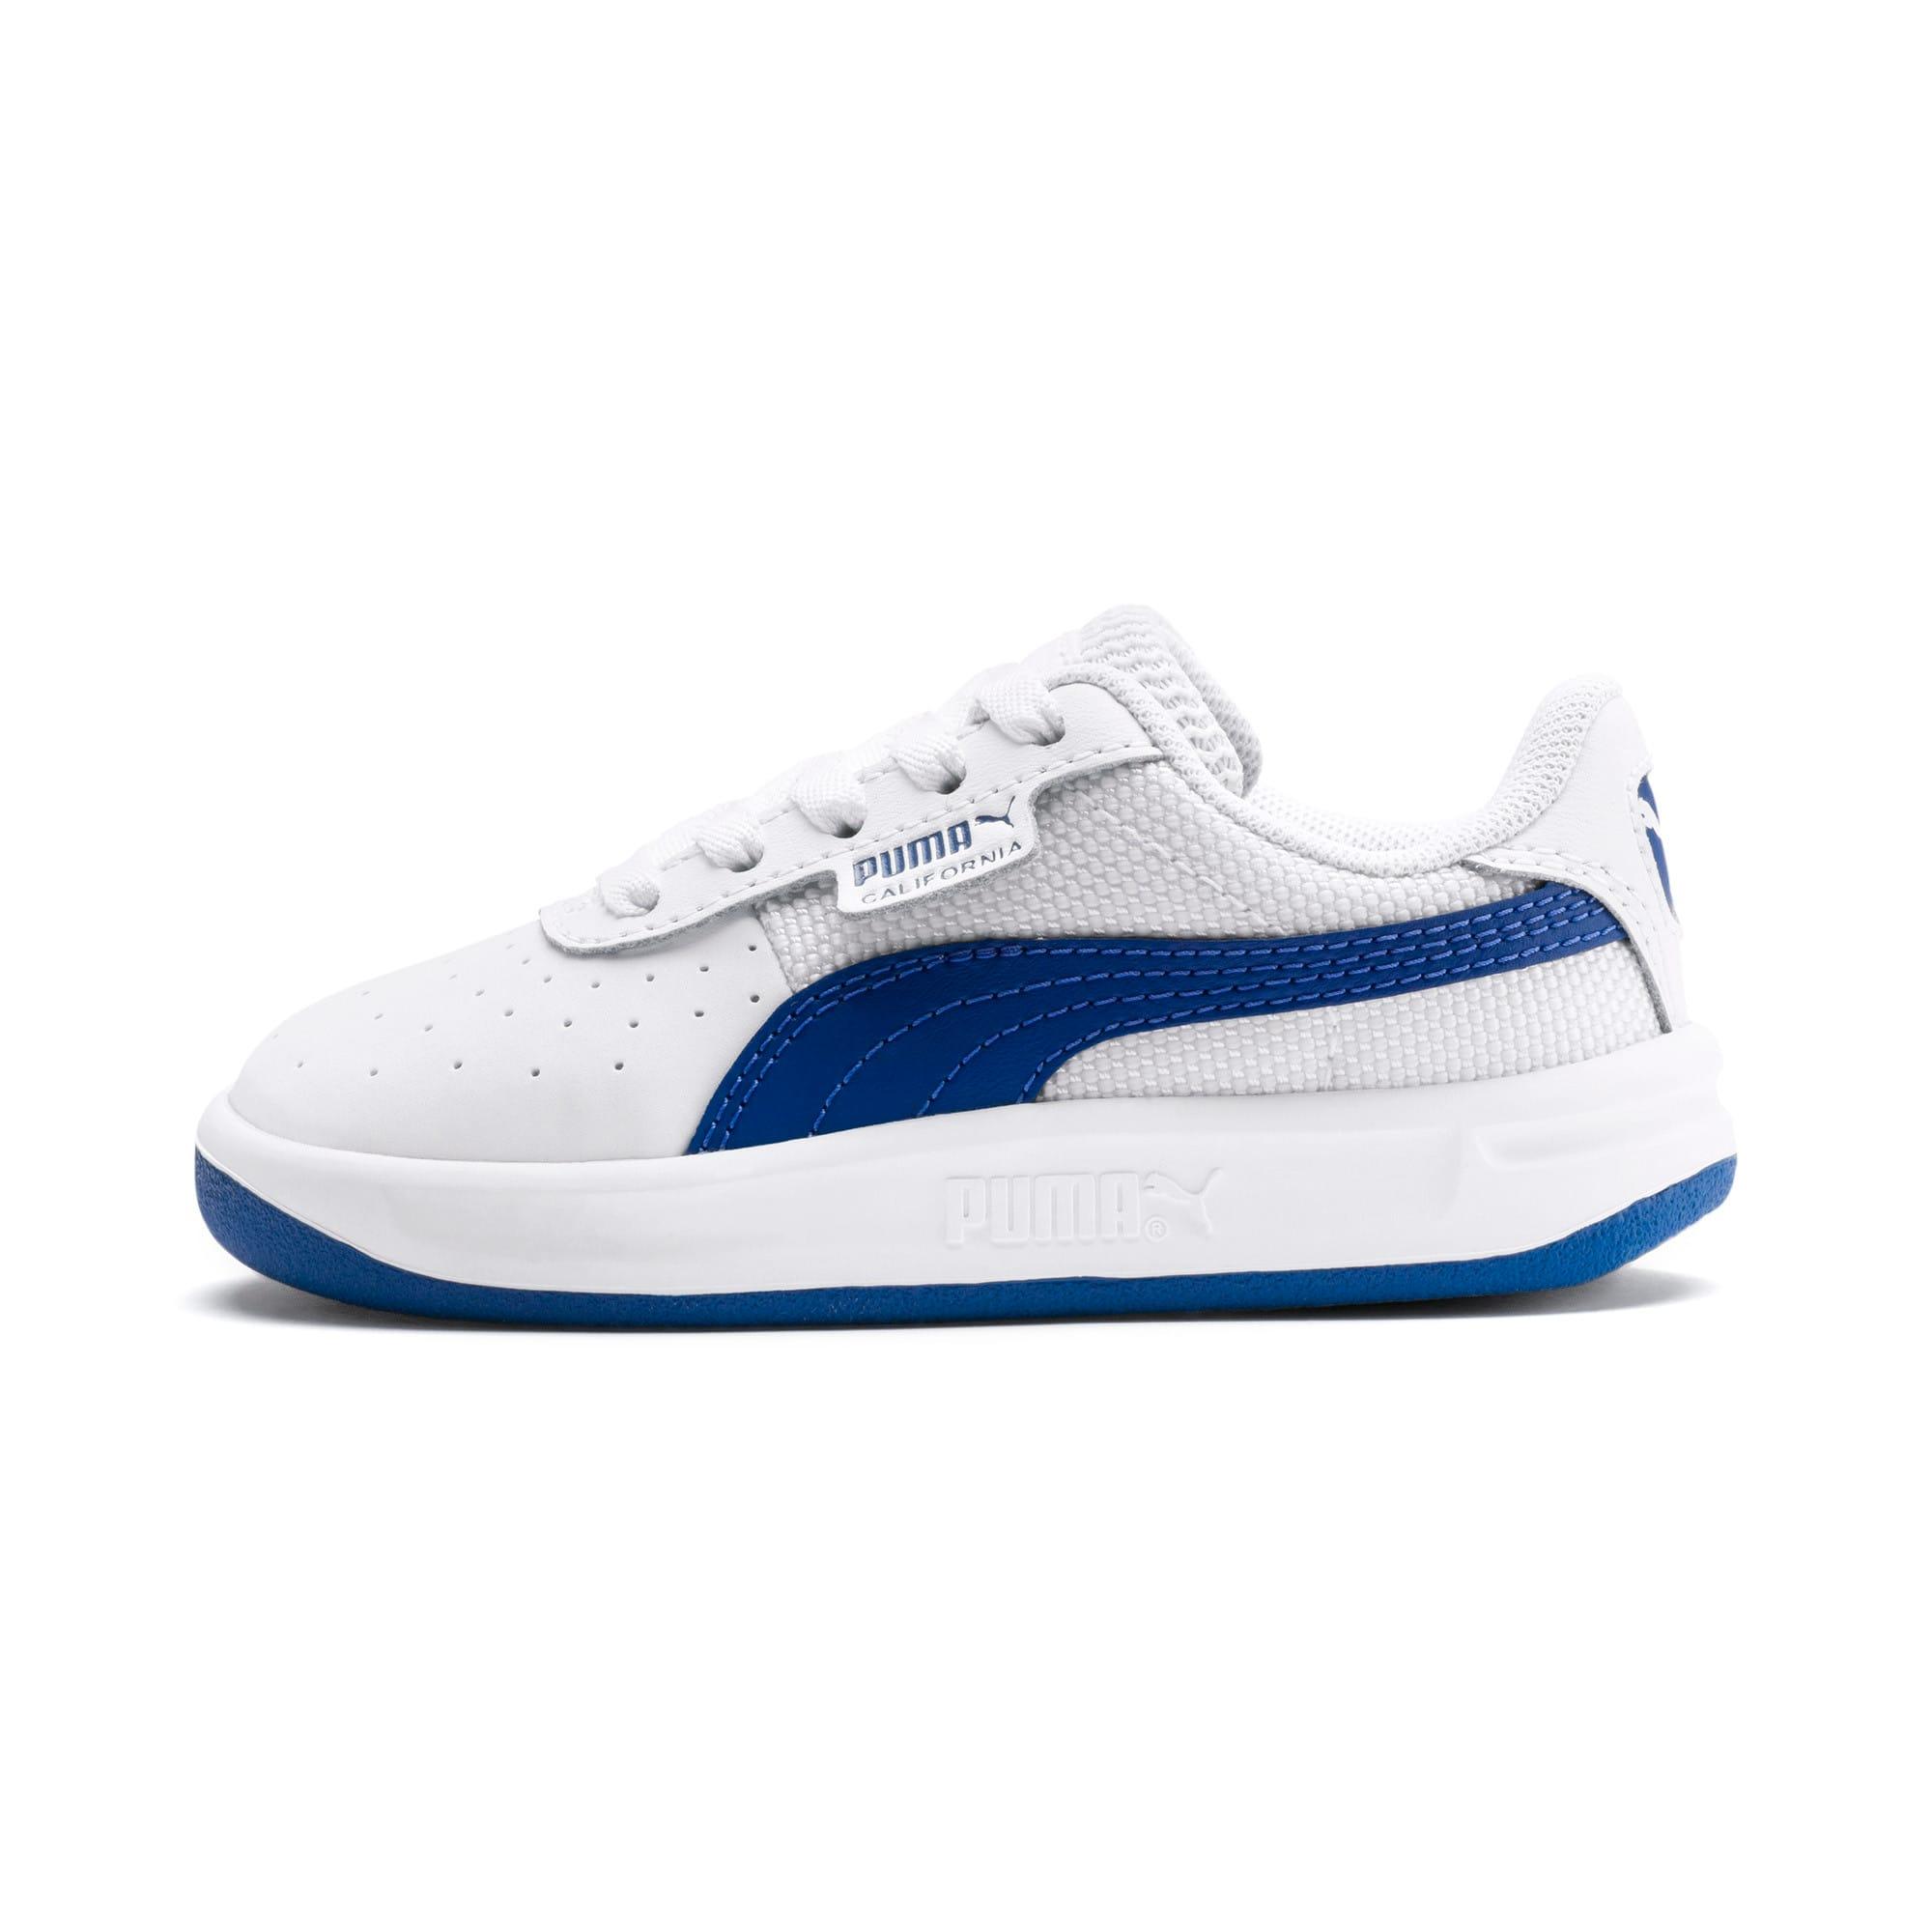 Thumbnail 1 of California Toddler Shoes, Puma White-Galaxy Blue, medium